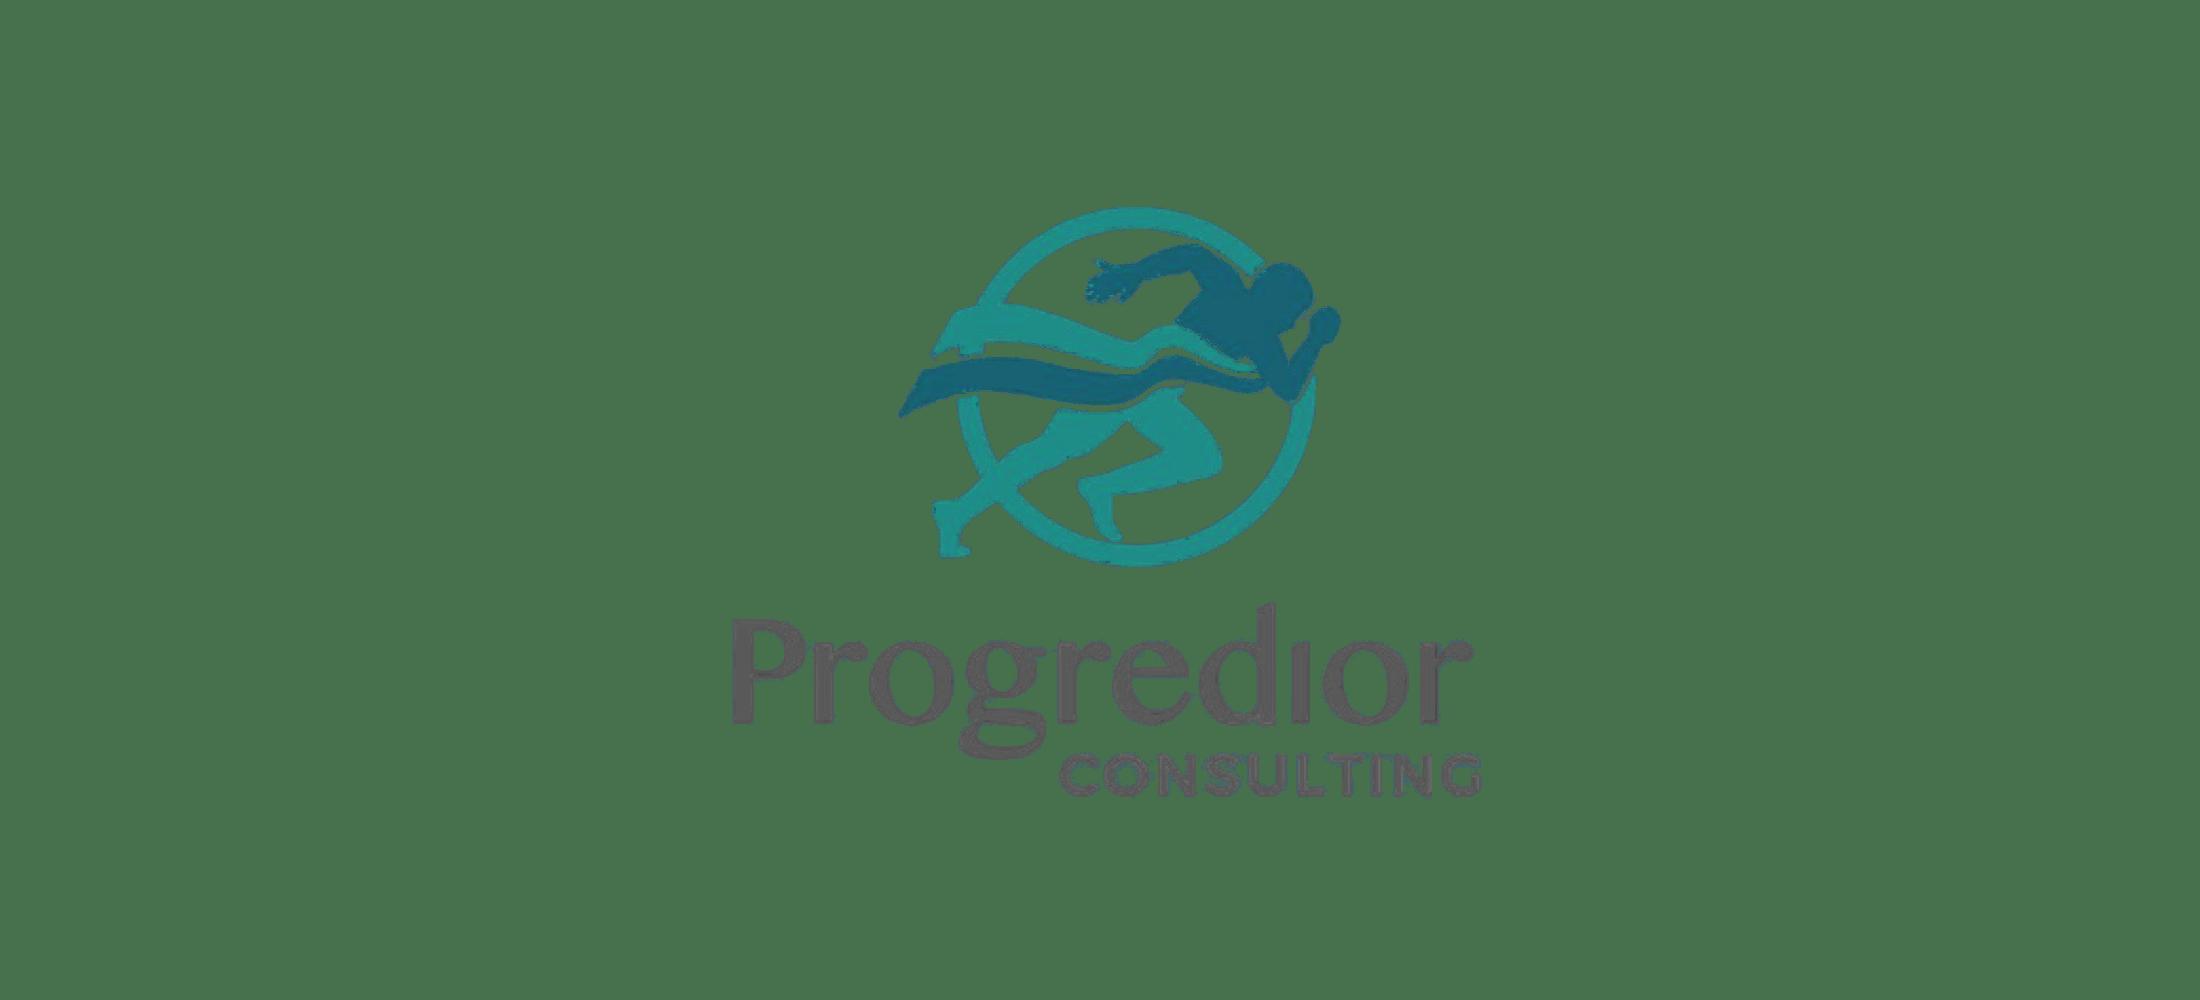 testprogredior101